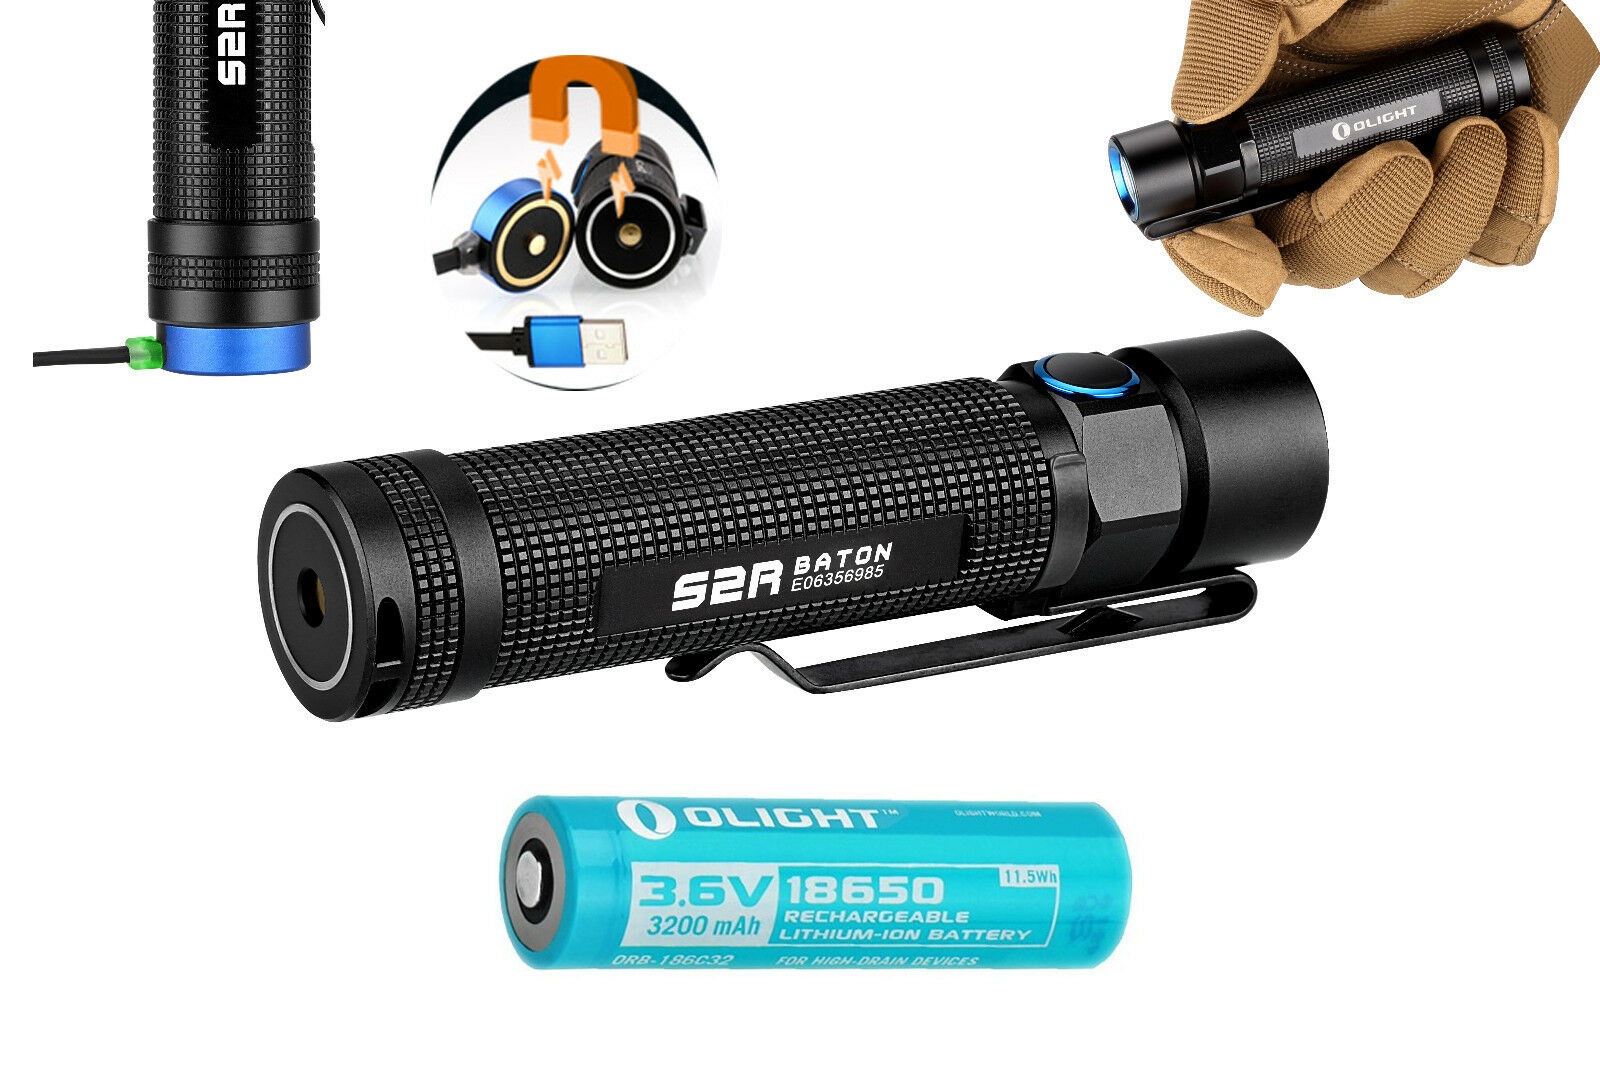 Olight S2R Baton 1020 Lumen 18650 Rechargeable LED Flashlight S1 S1R S2 Upgrade